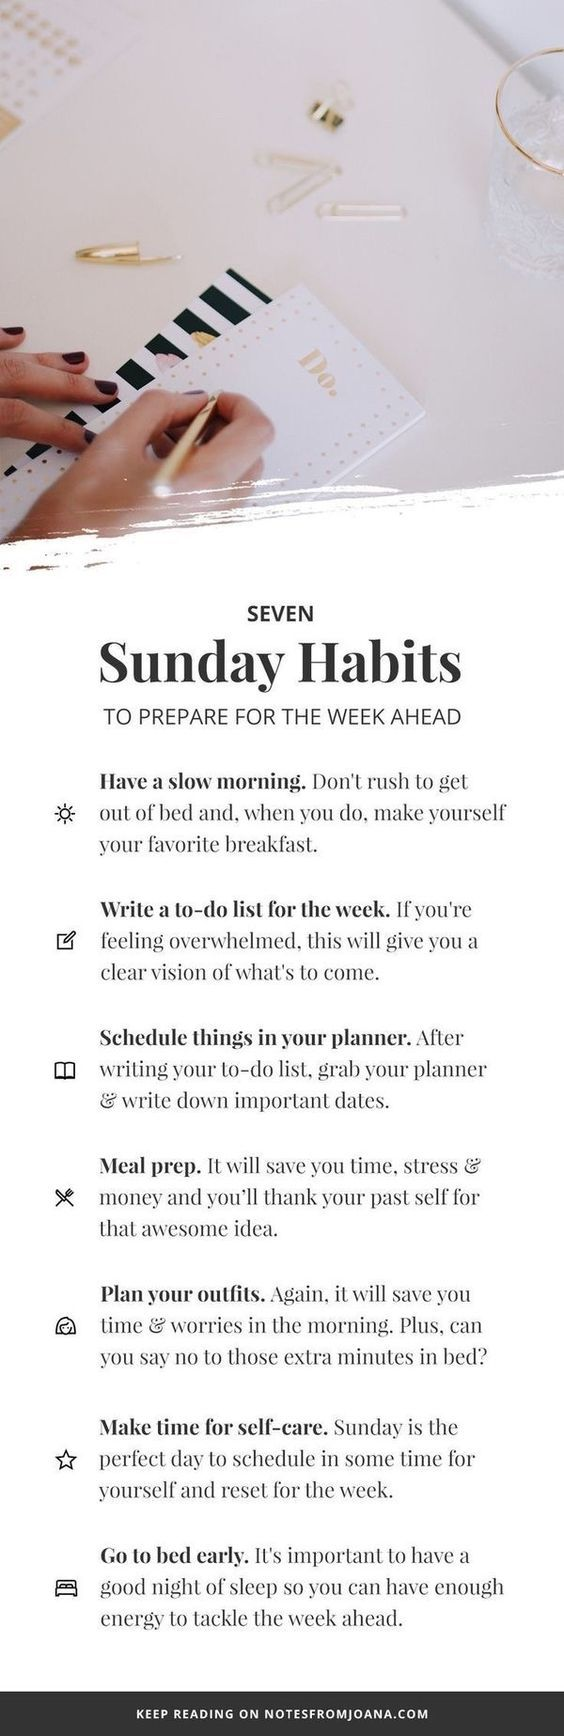 7 sunday habits.jpg